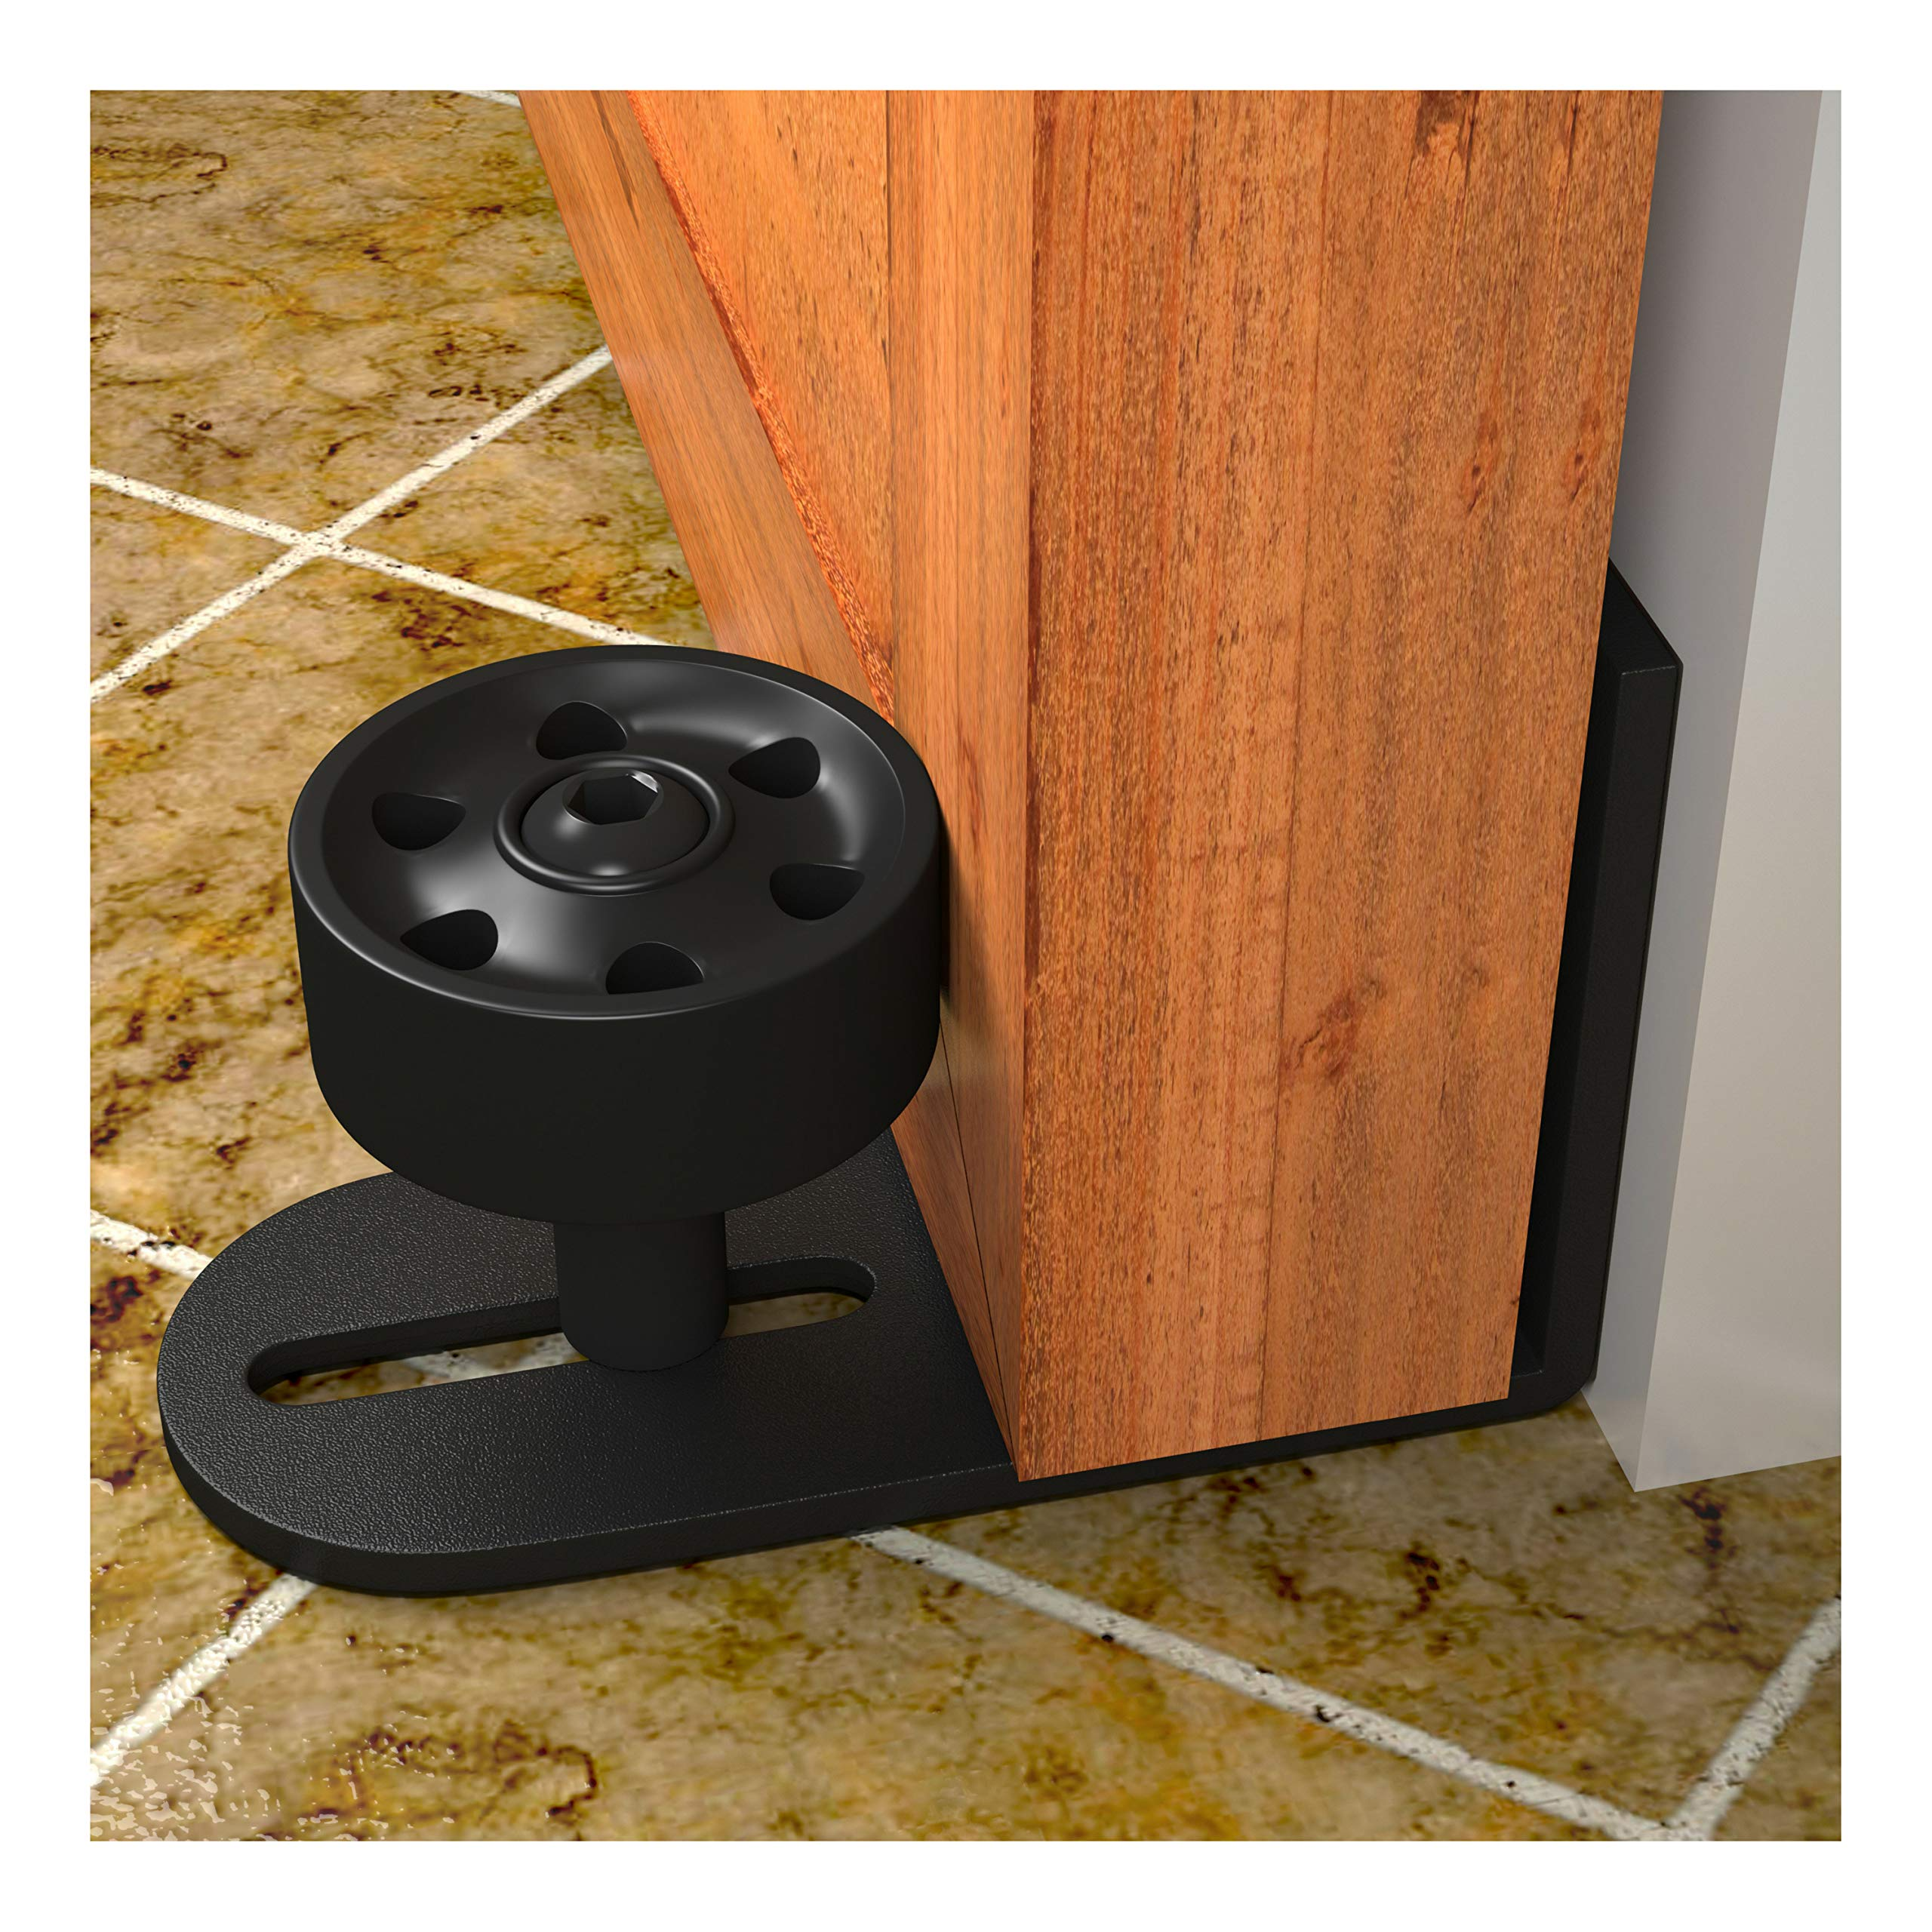 Barn Door Floor Guides with''Ball Bearings'' | Adjustable Stay Roller Bottom Sliding Doors | Wall Mounted Bracket Flat on Floor | All Black Hardware Kit Matches Pulls Locks Handle Tracks | Promo Sale!